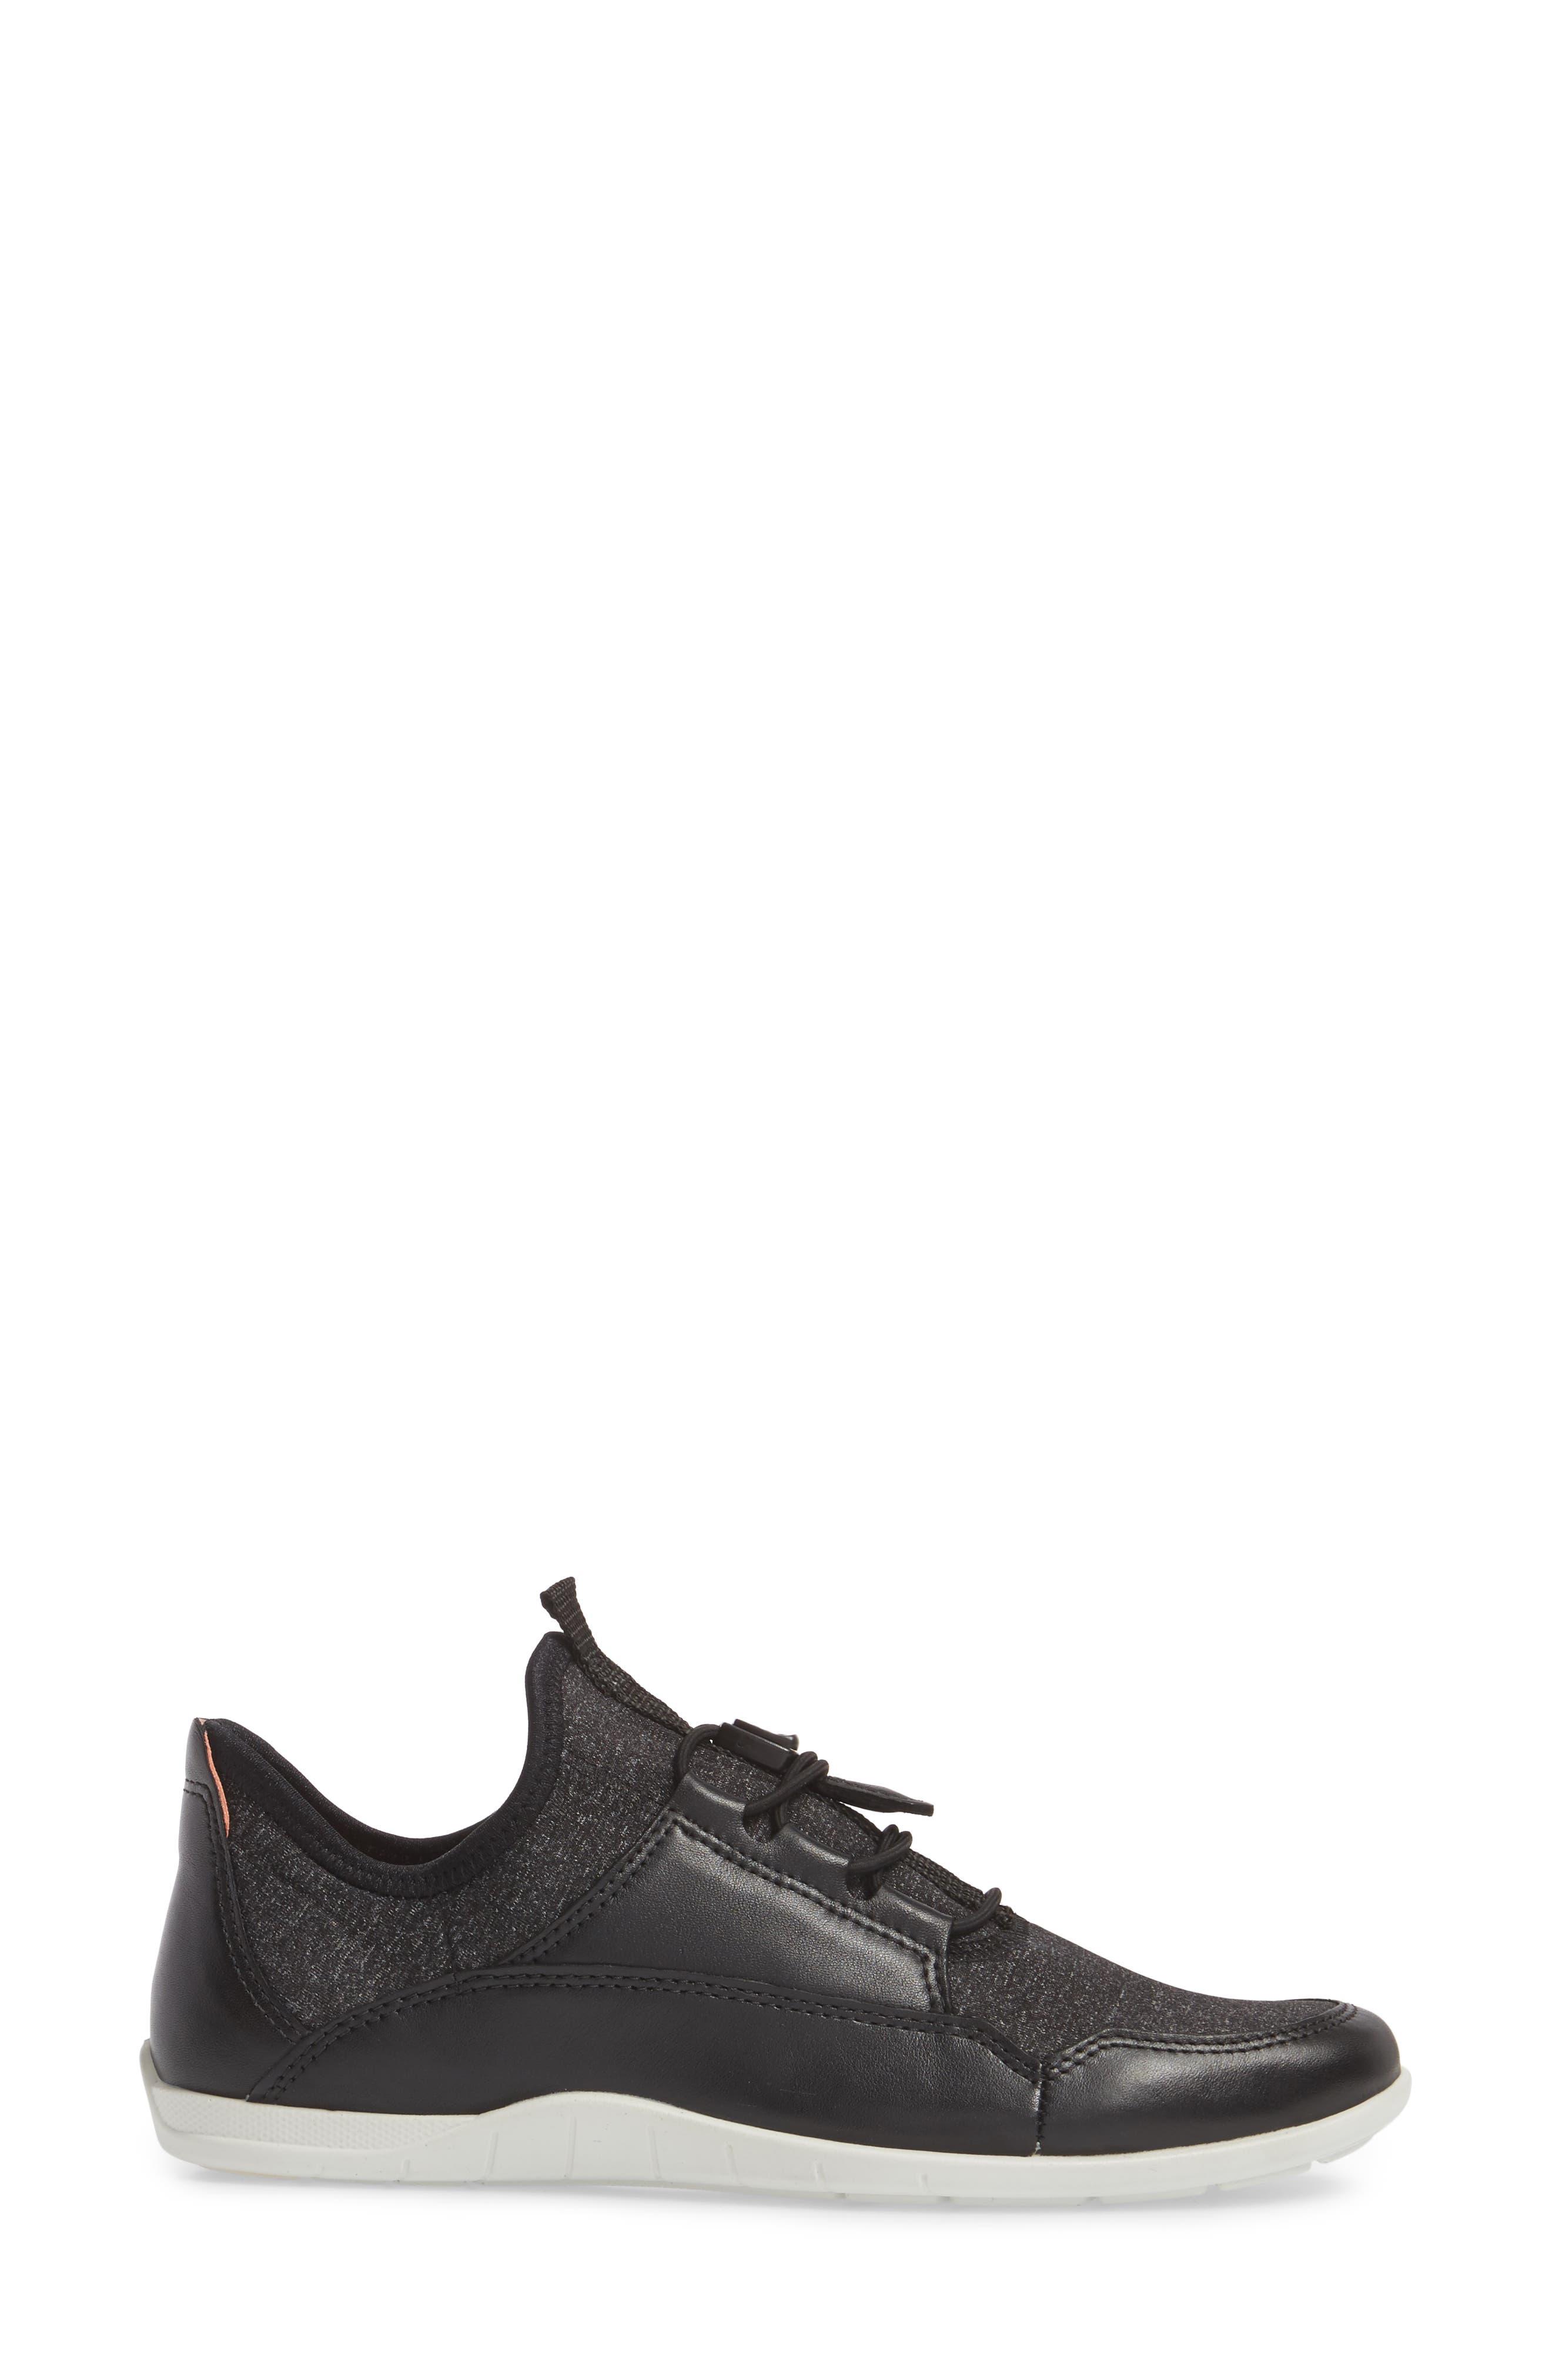 Bluma Speedlace Sneaker,                             Alternate thumbnail 3, color,                             001